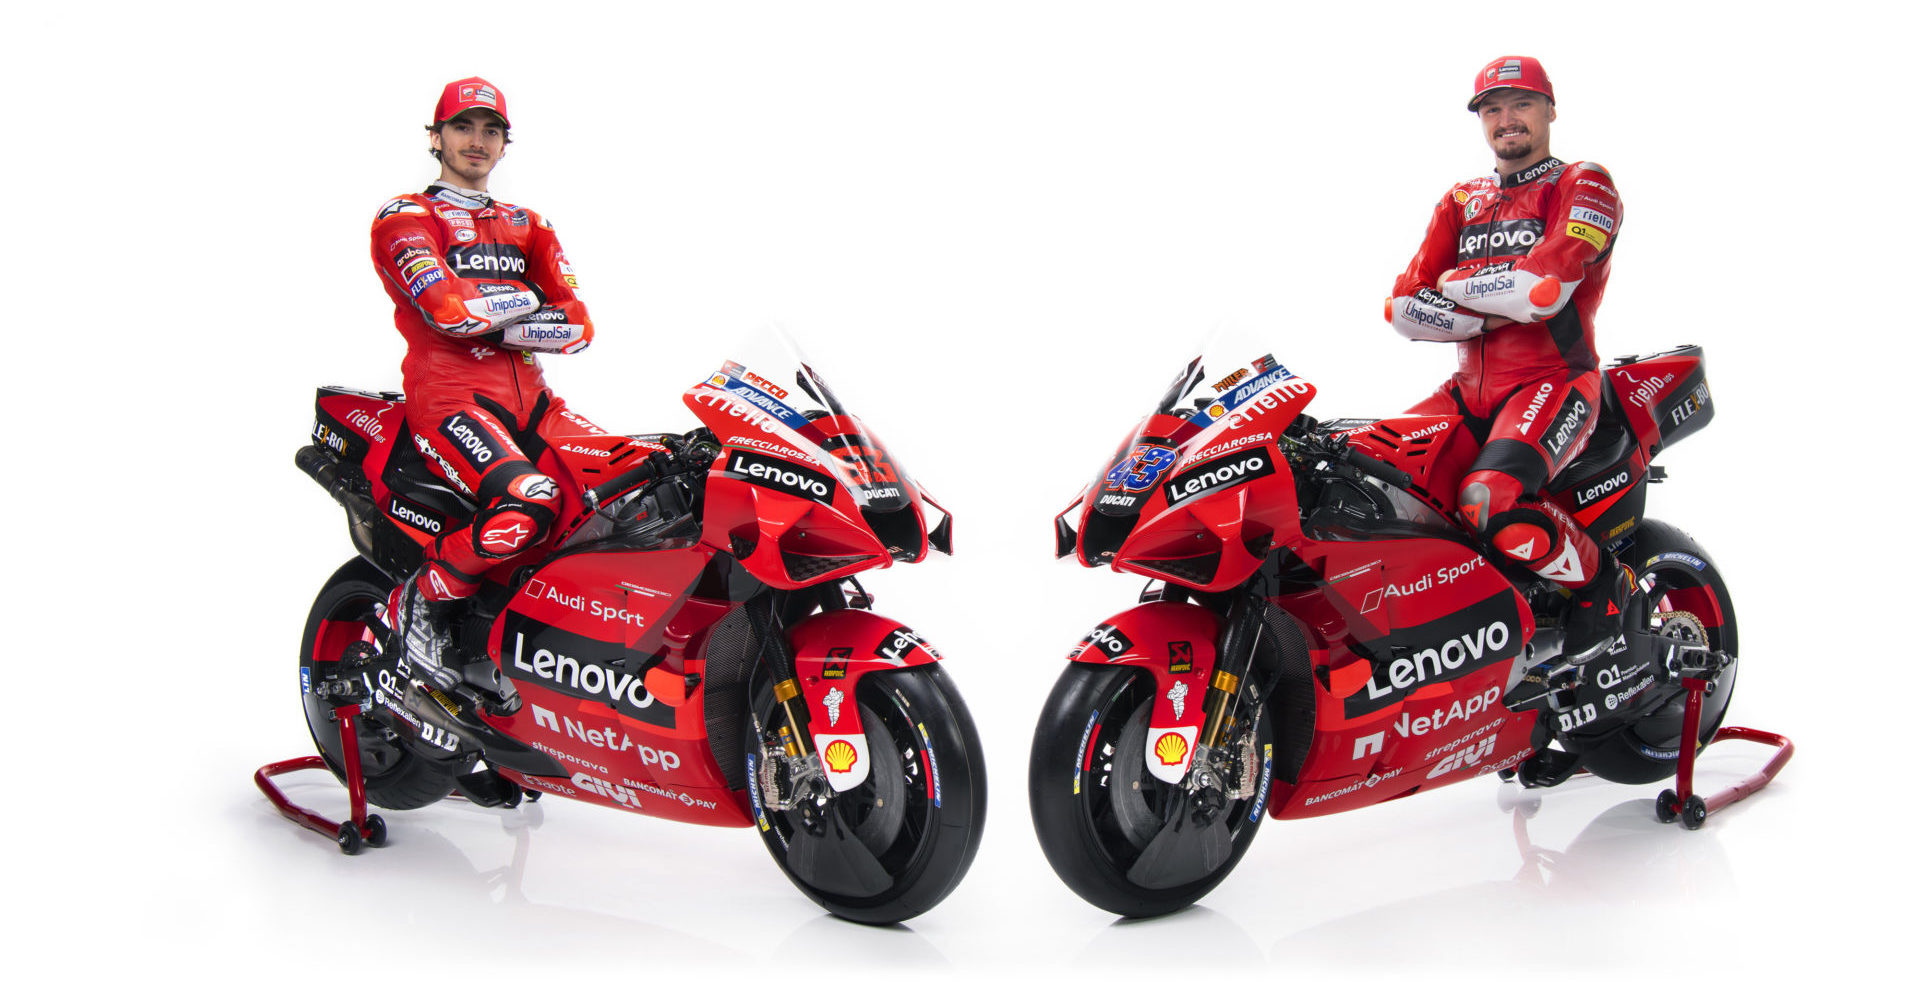 Francesco Bagnaia (left) and Jack Miller (right). Photo courtesy Ducati.